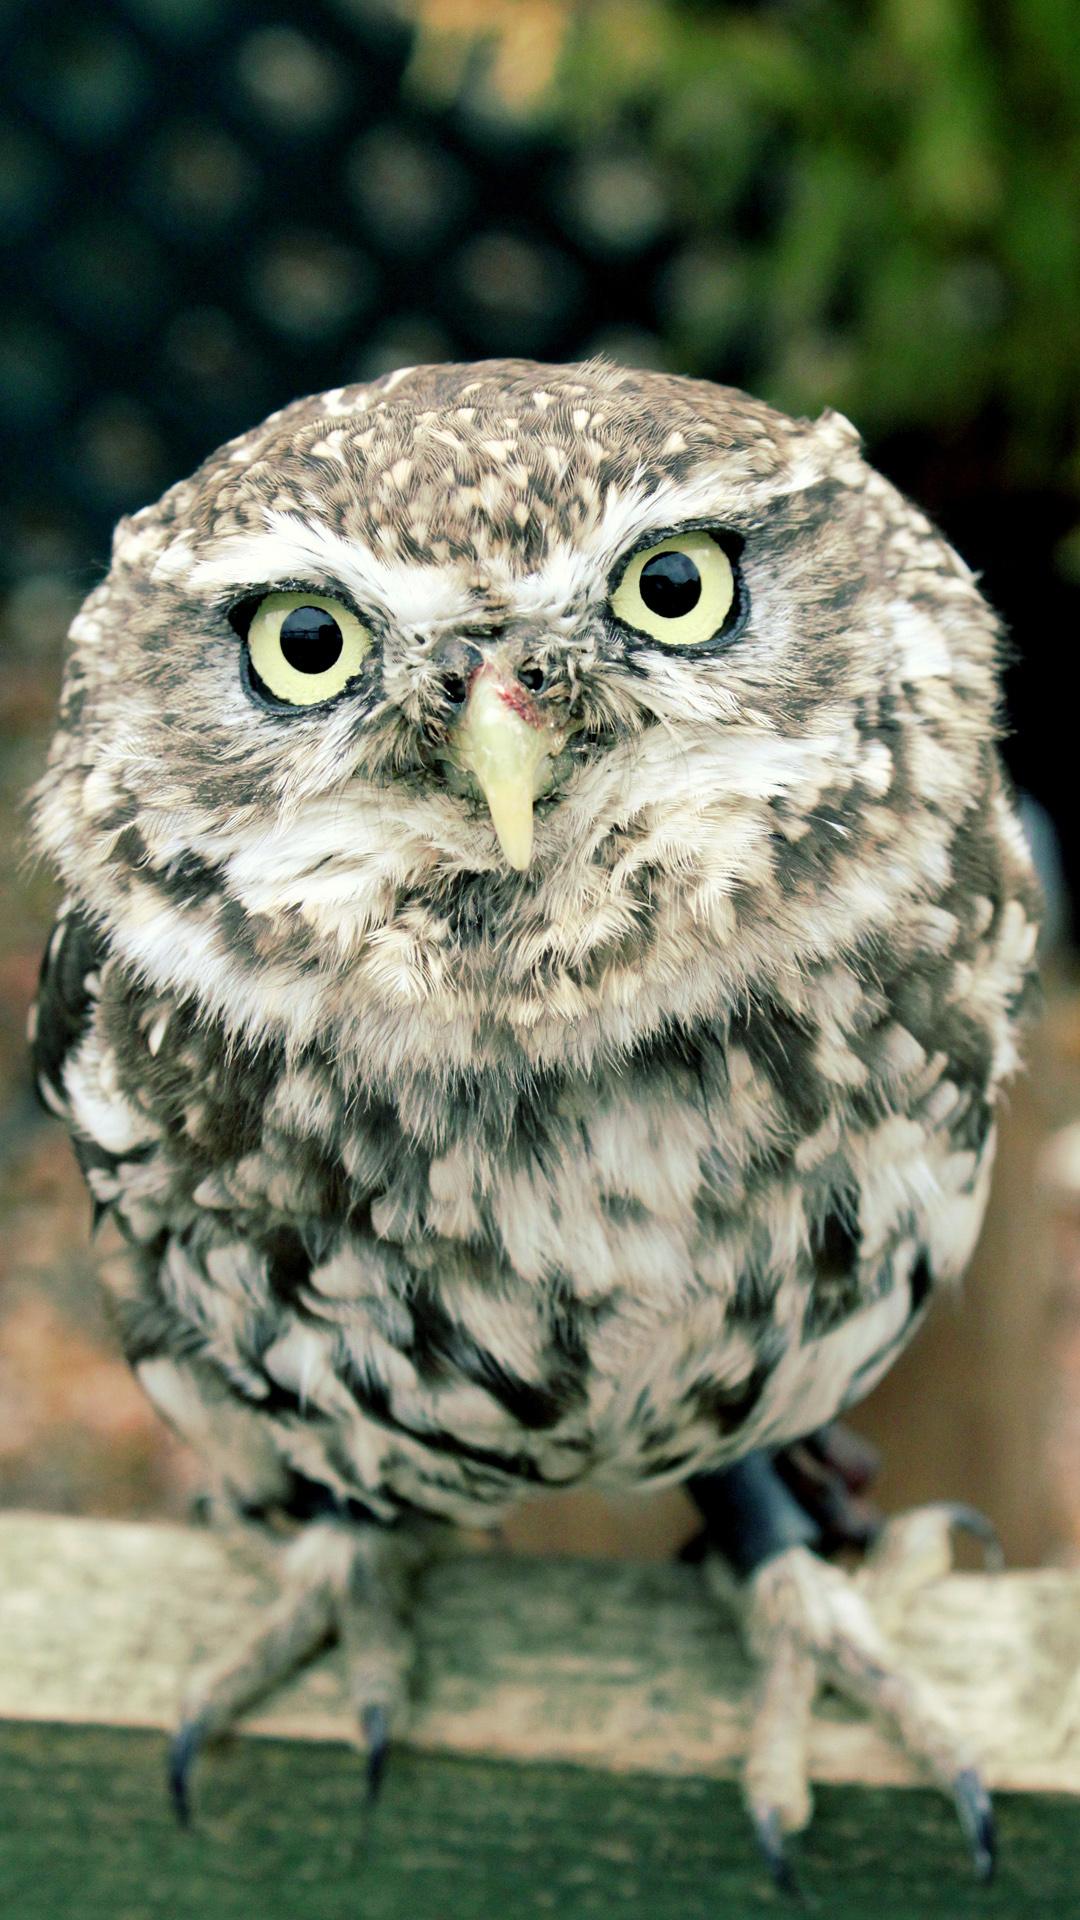 Download Cute Owl Wallpaper IPhone 6 750x1134 1080x1920